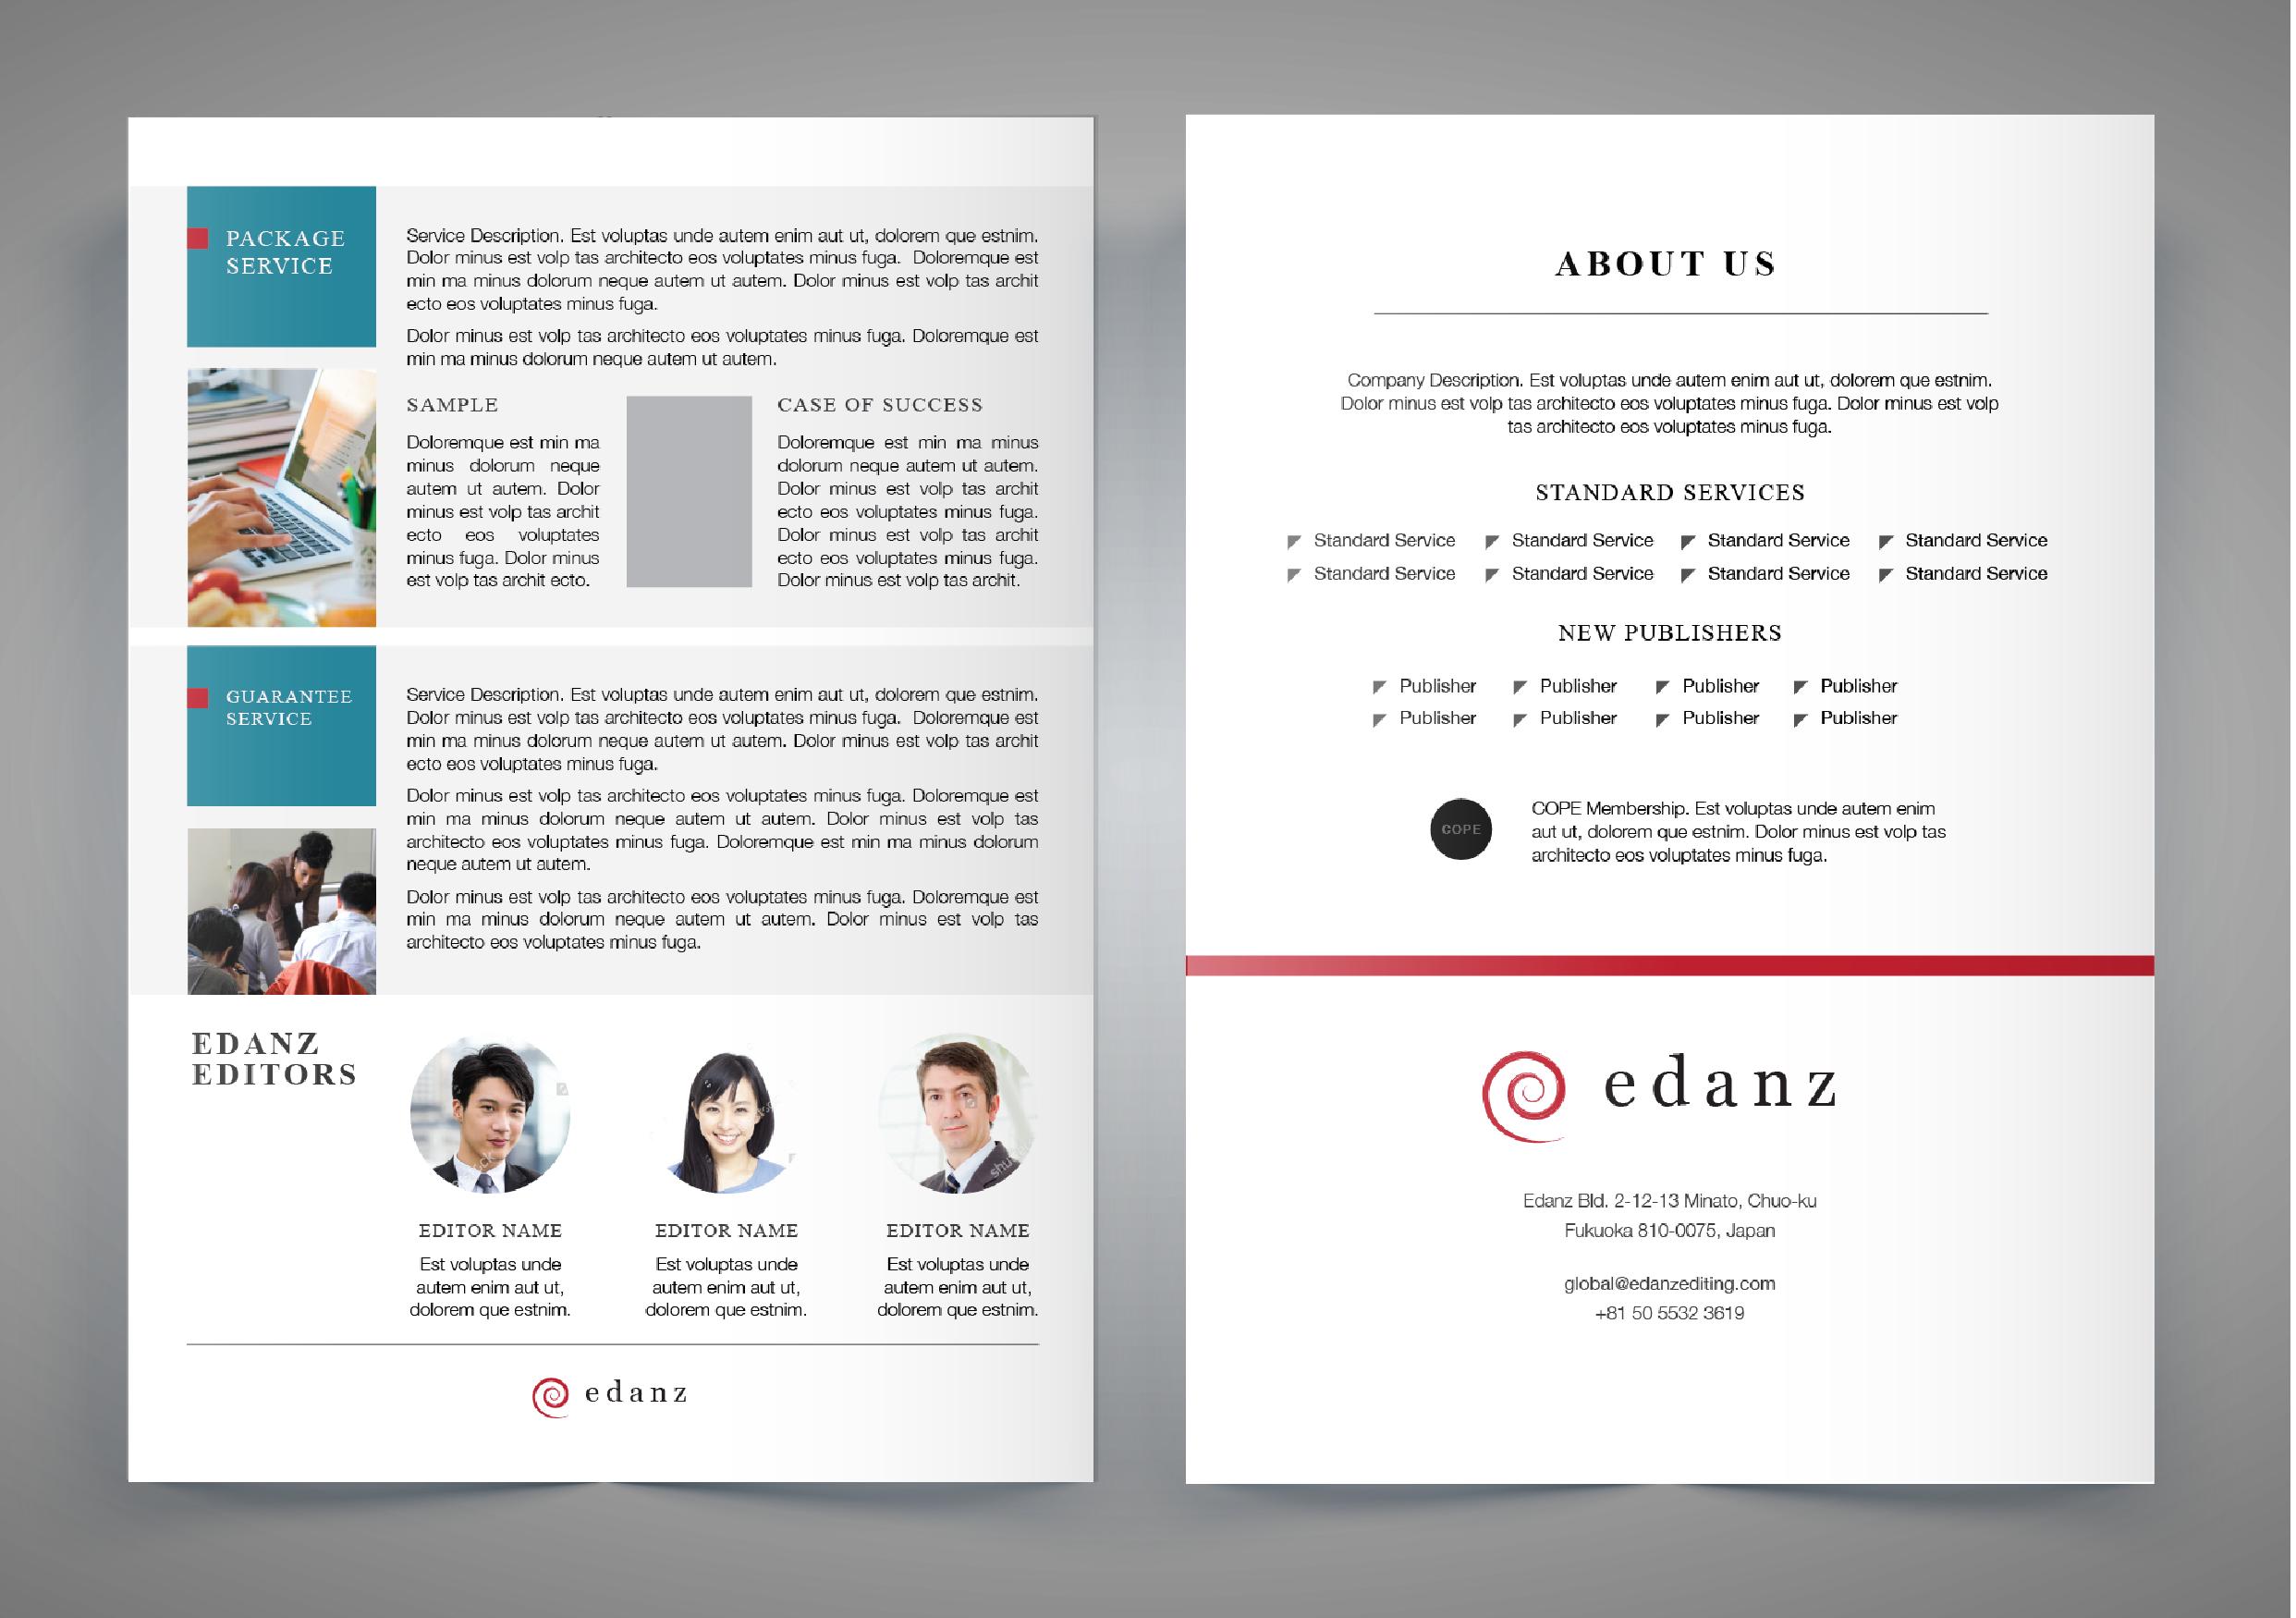 Edanz_fold-02.png